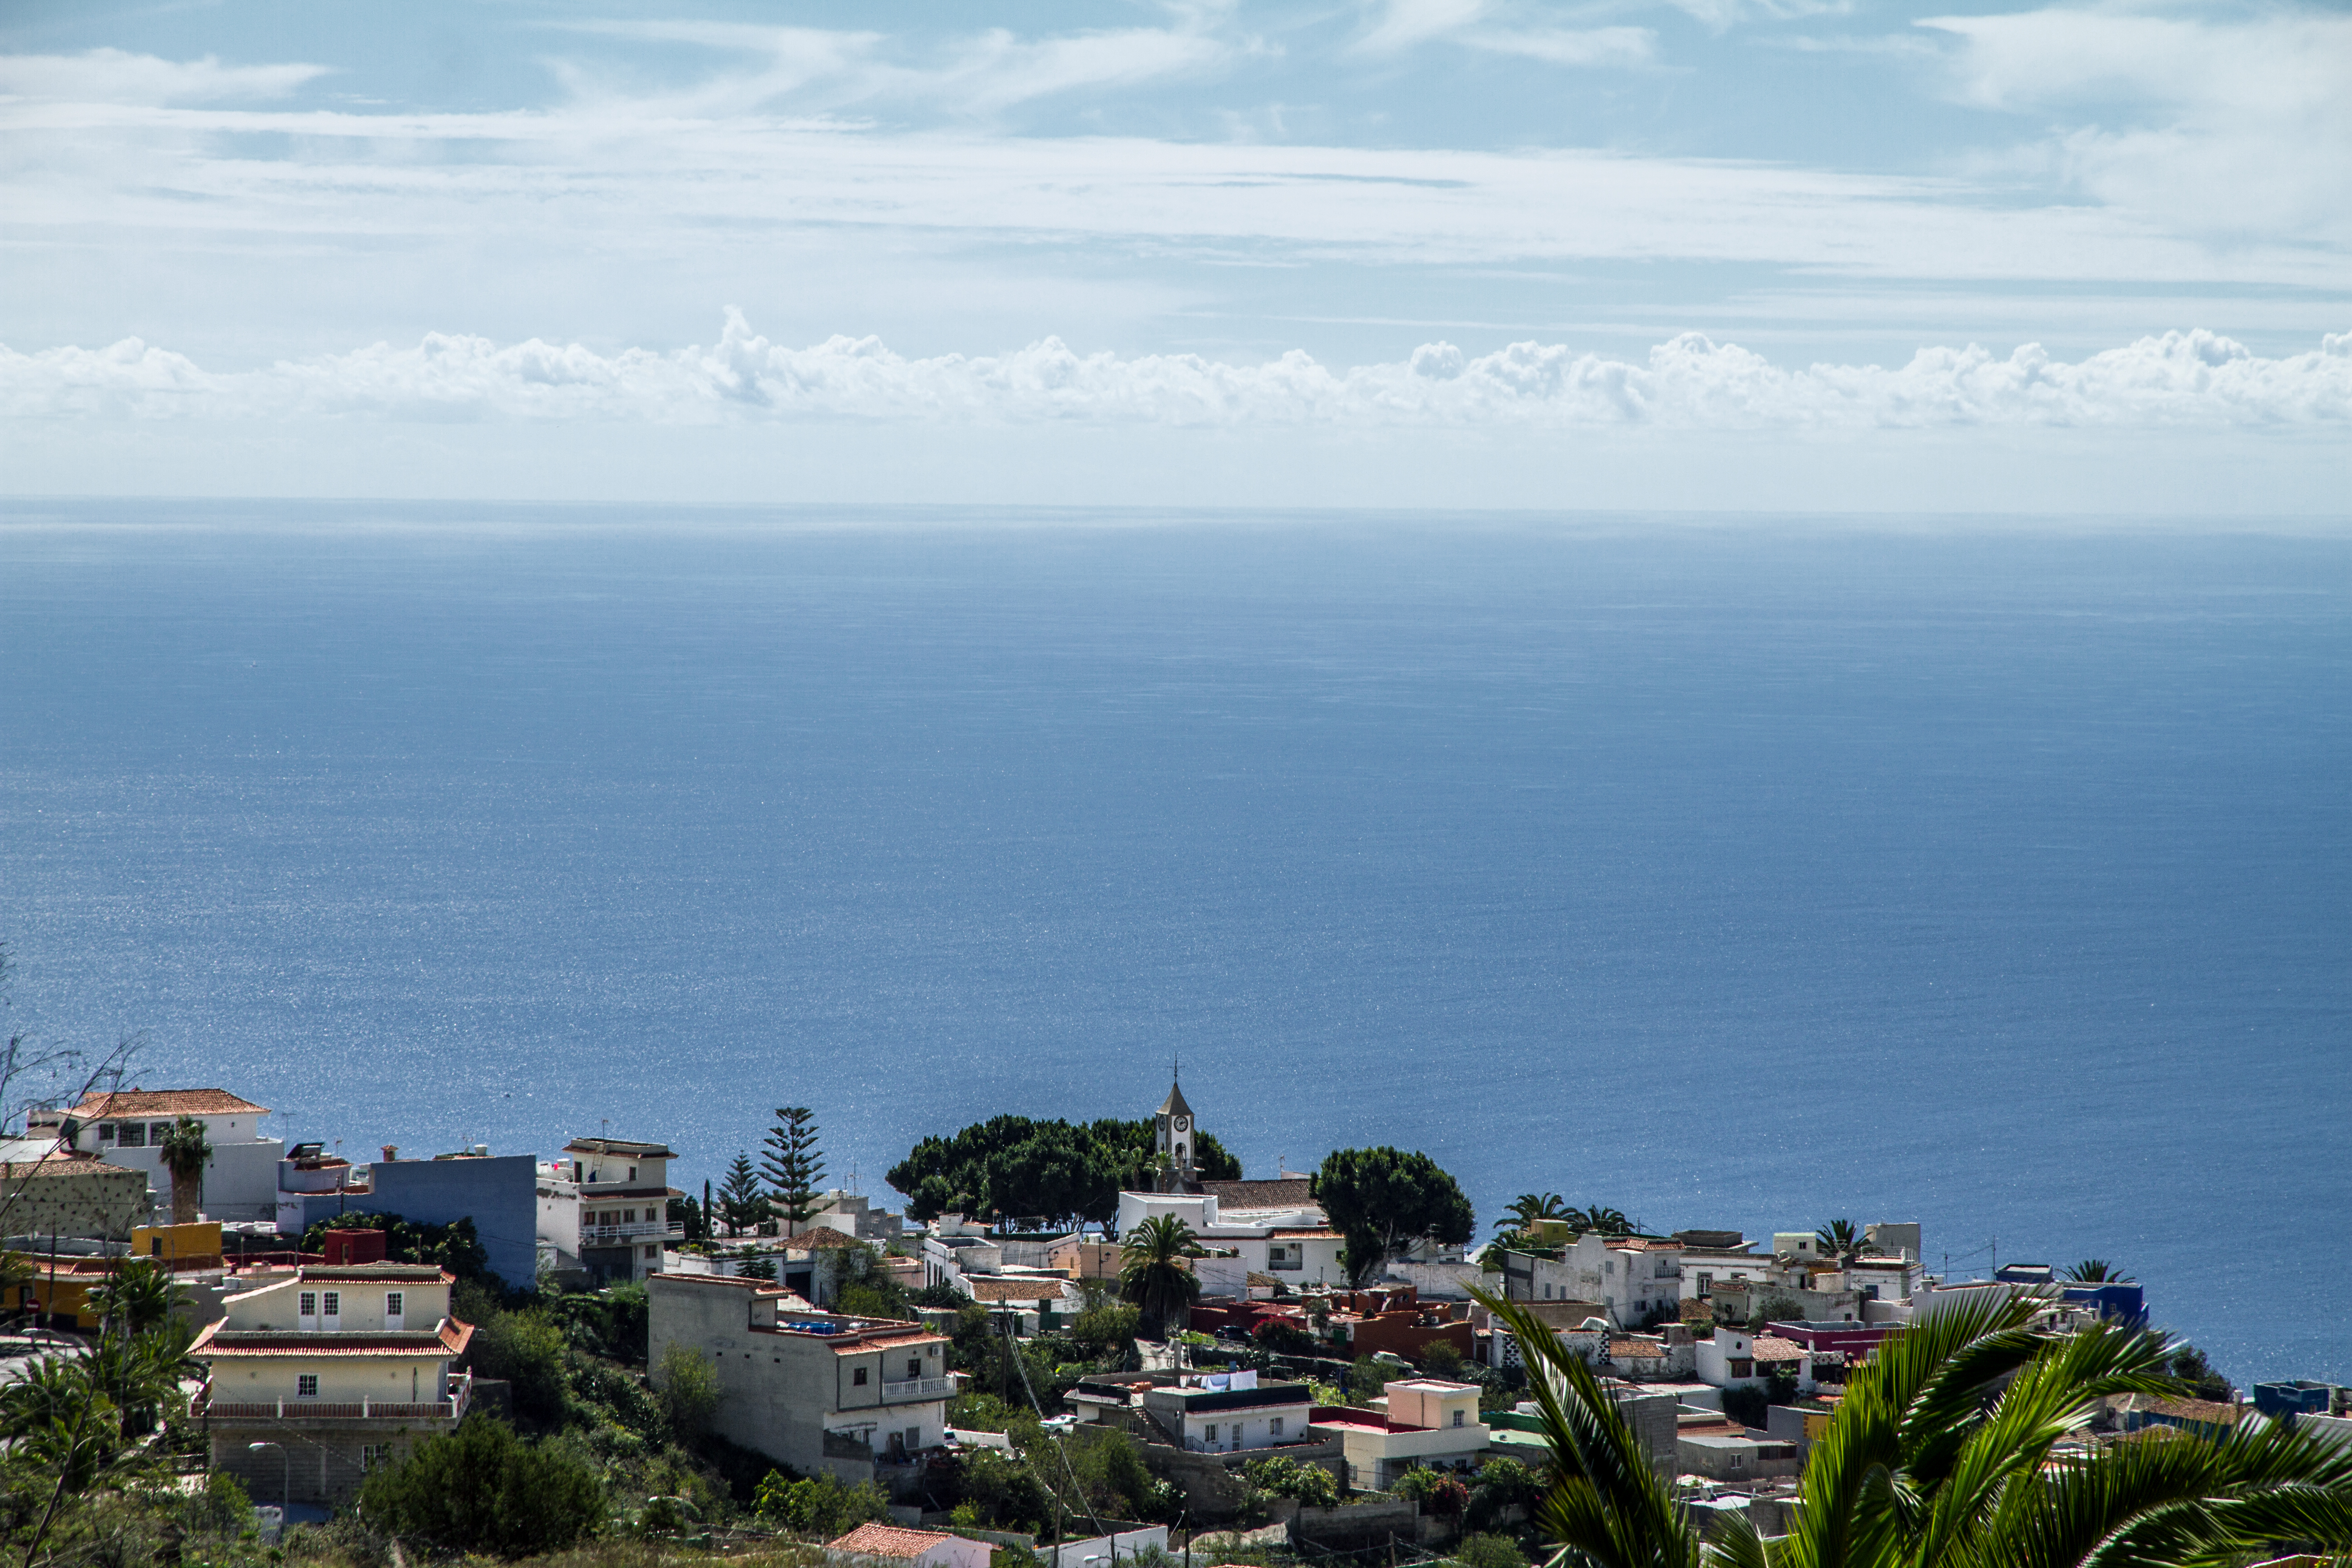 Tenerife: Santiago del Teide